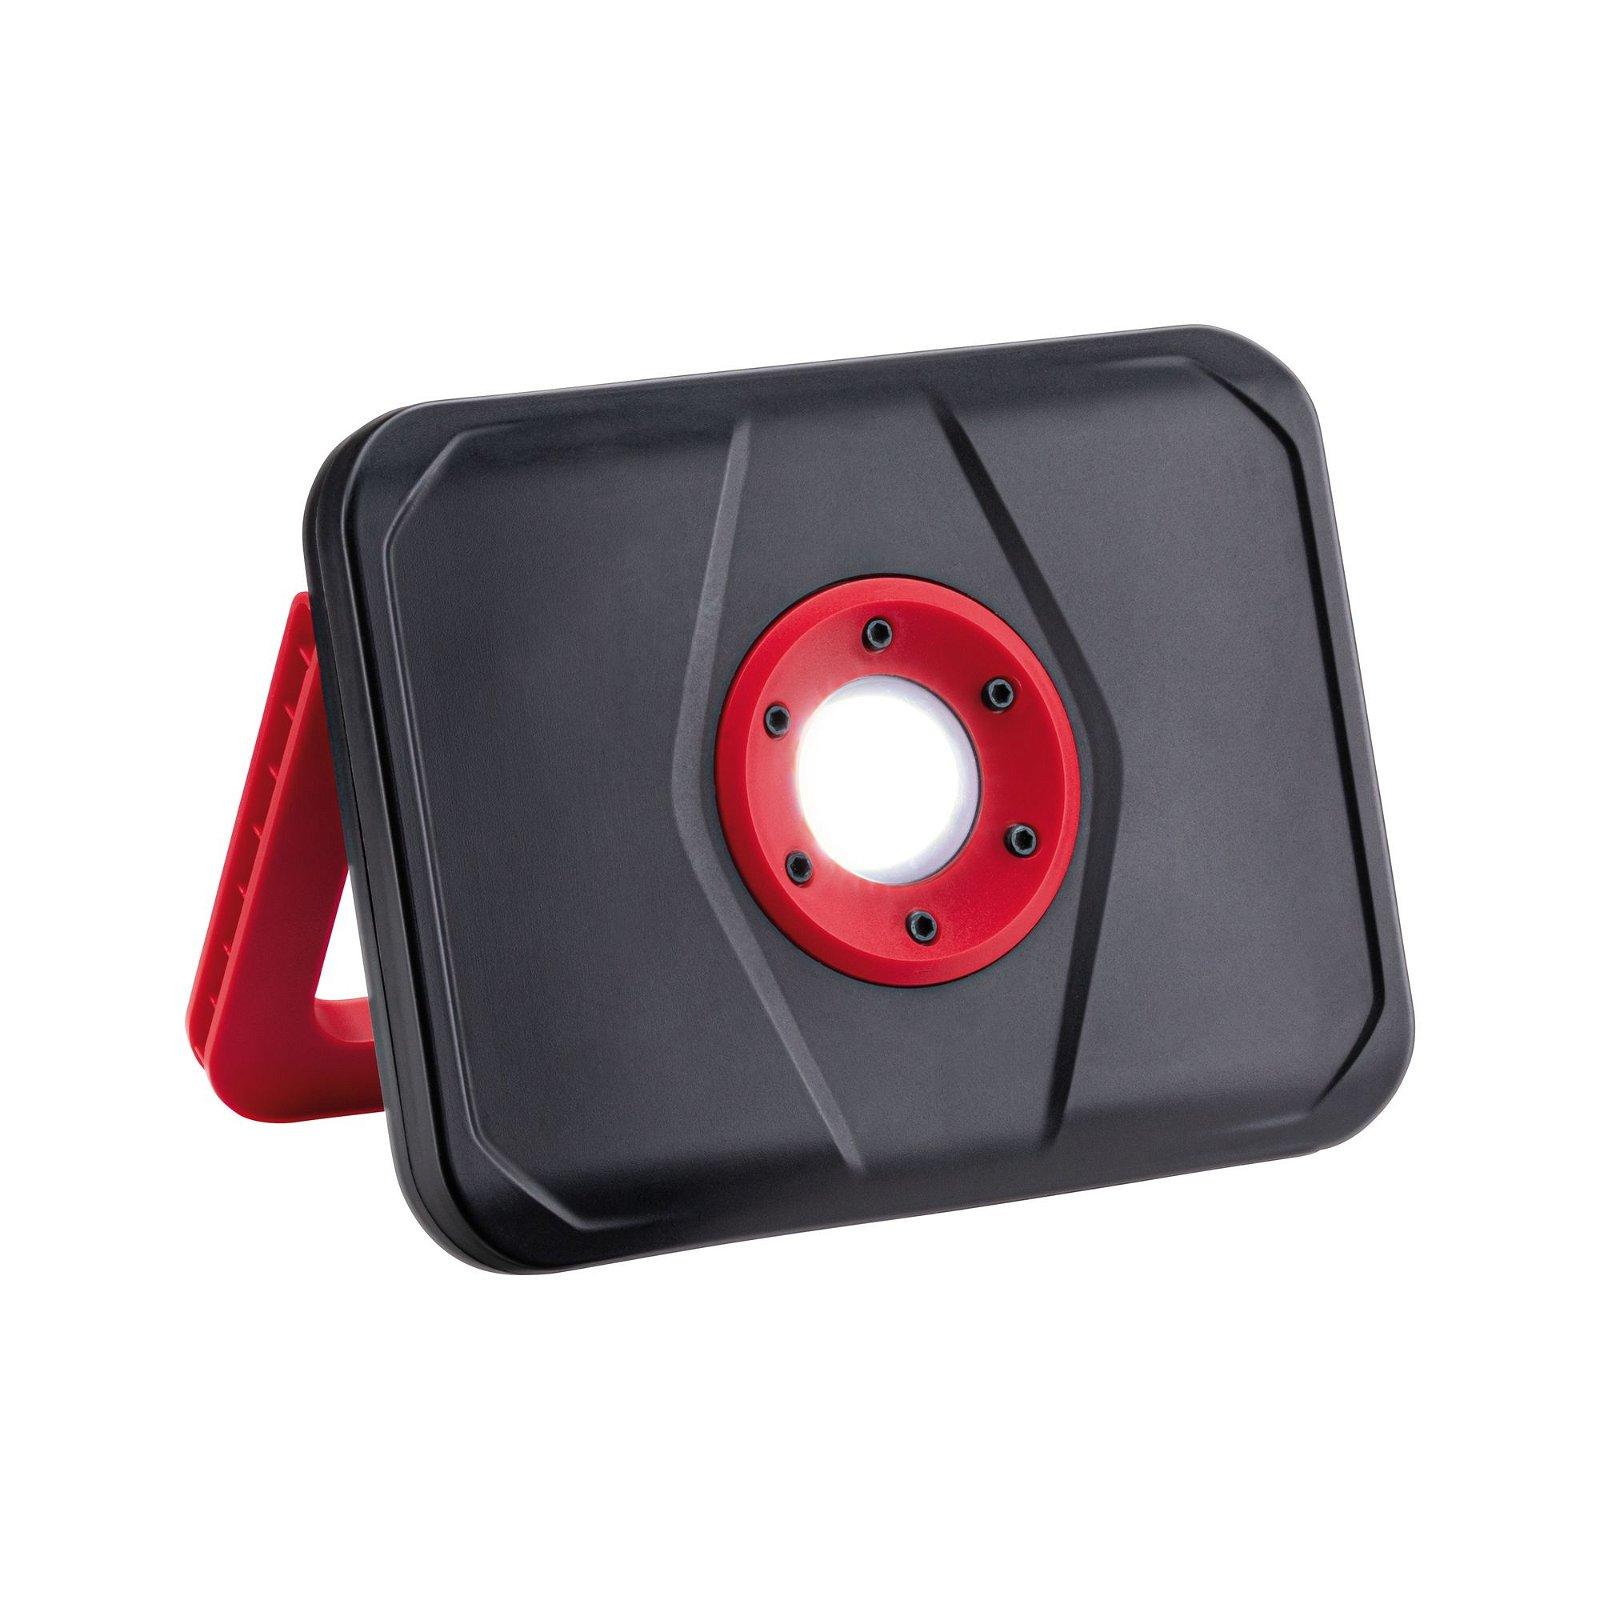 Acculamp Accu Worklight IP65 6500K Zwart/Rood